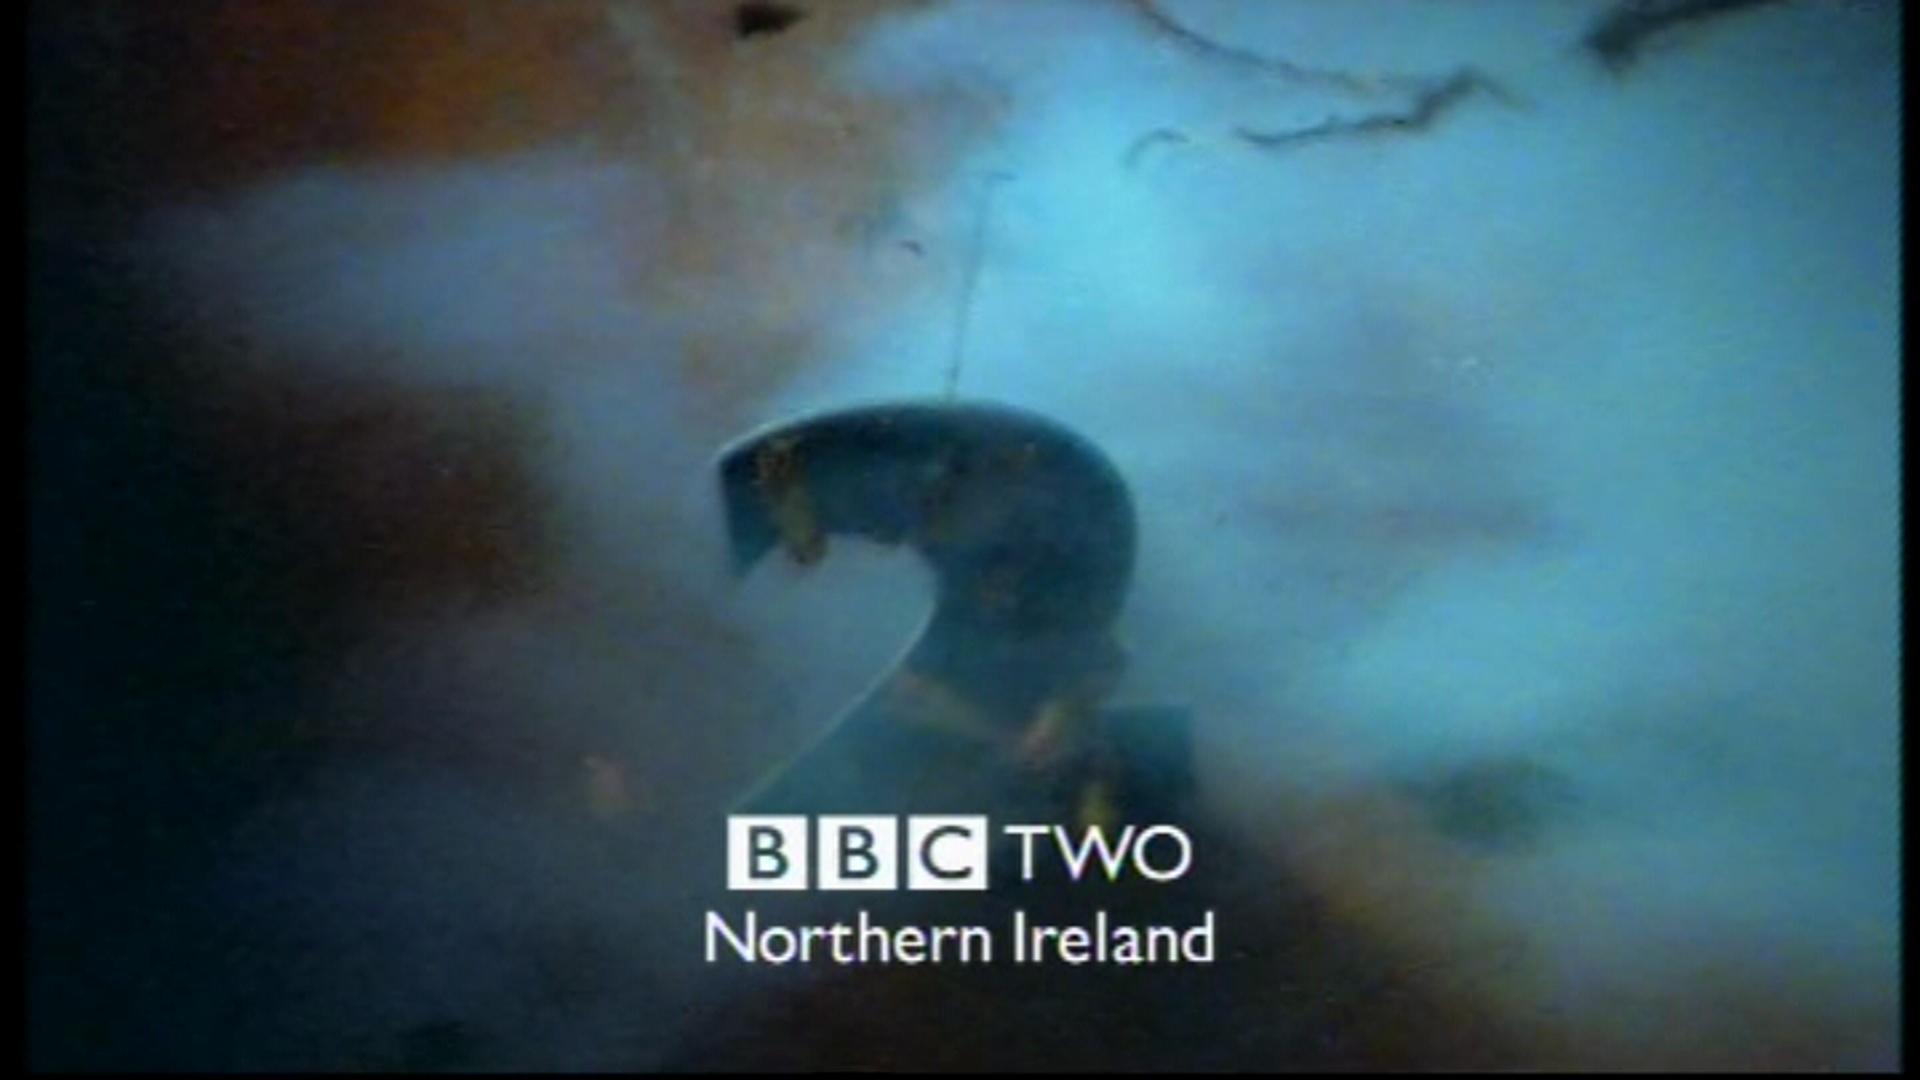 bbc two dog ident 2017 kabar bola terbaru vroh